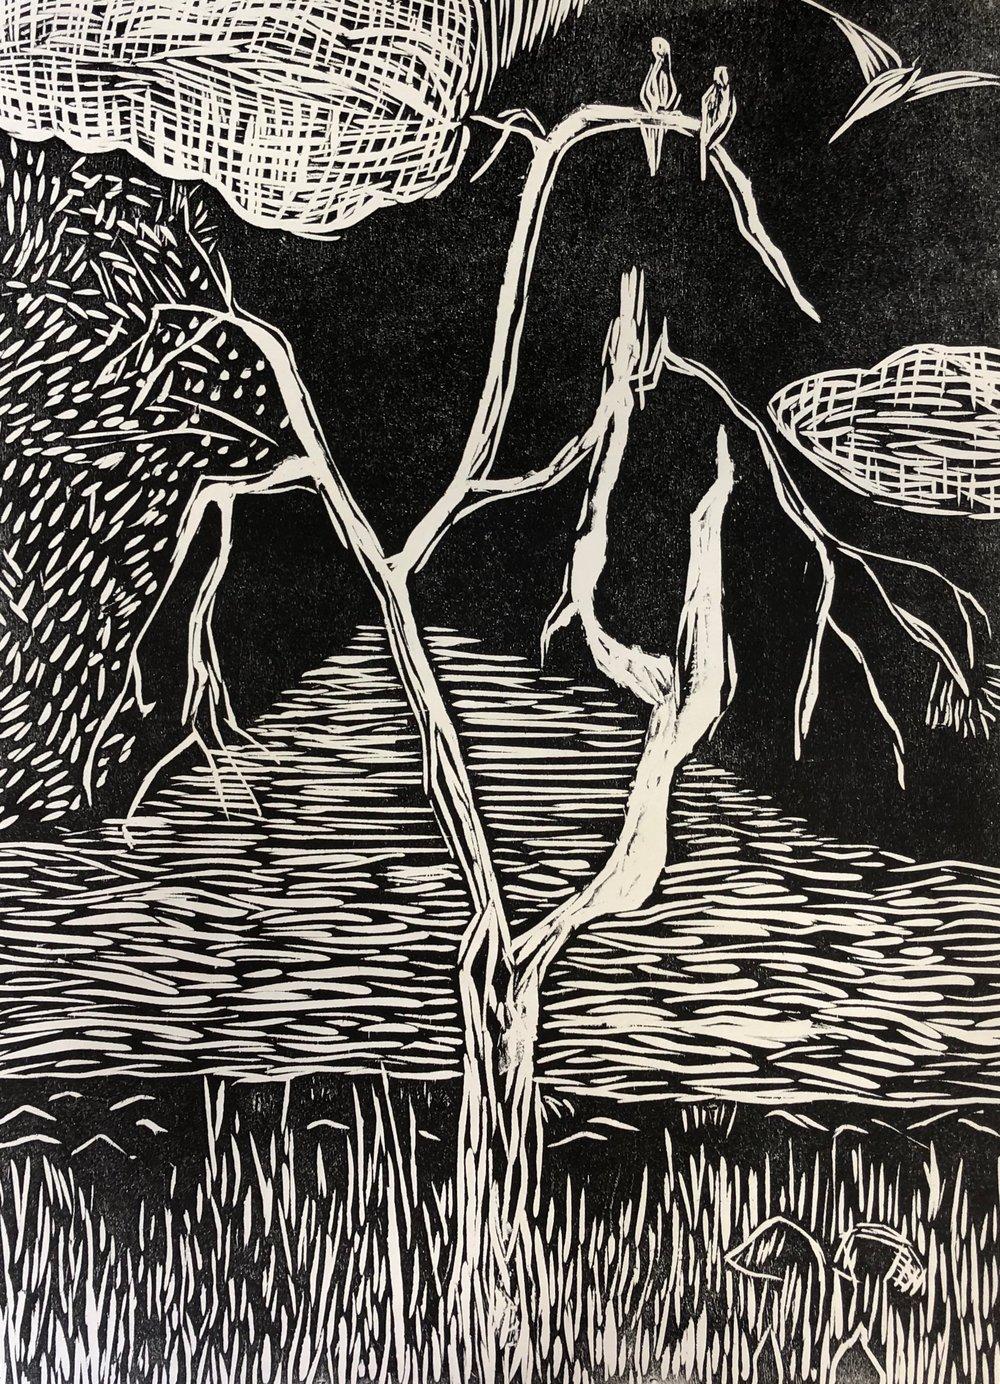 Woodcut Print - Redwood Shores